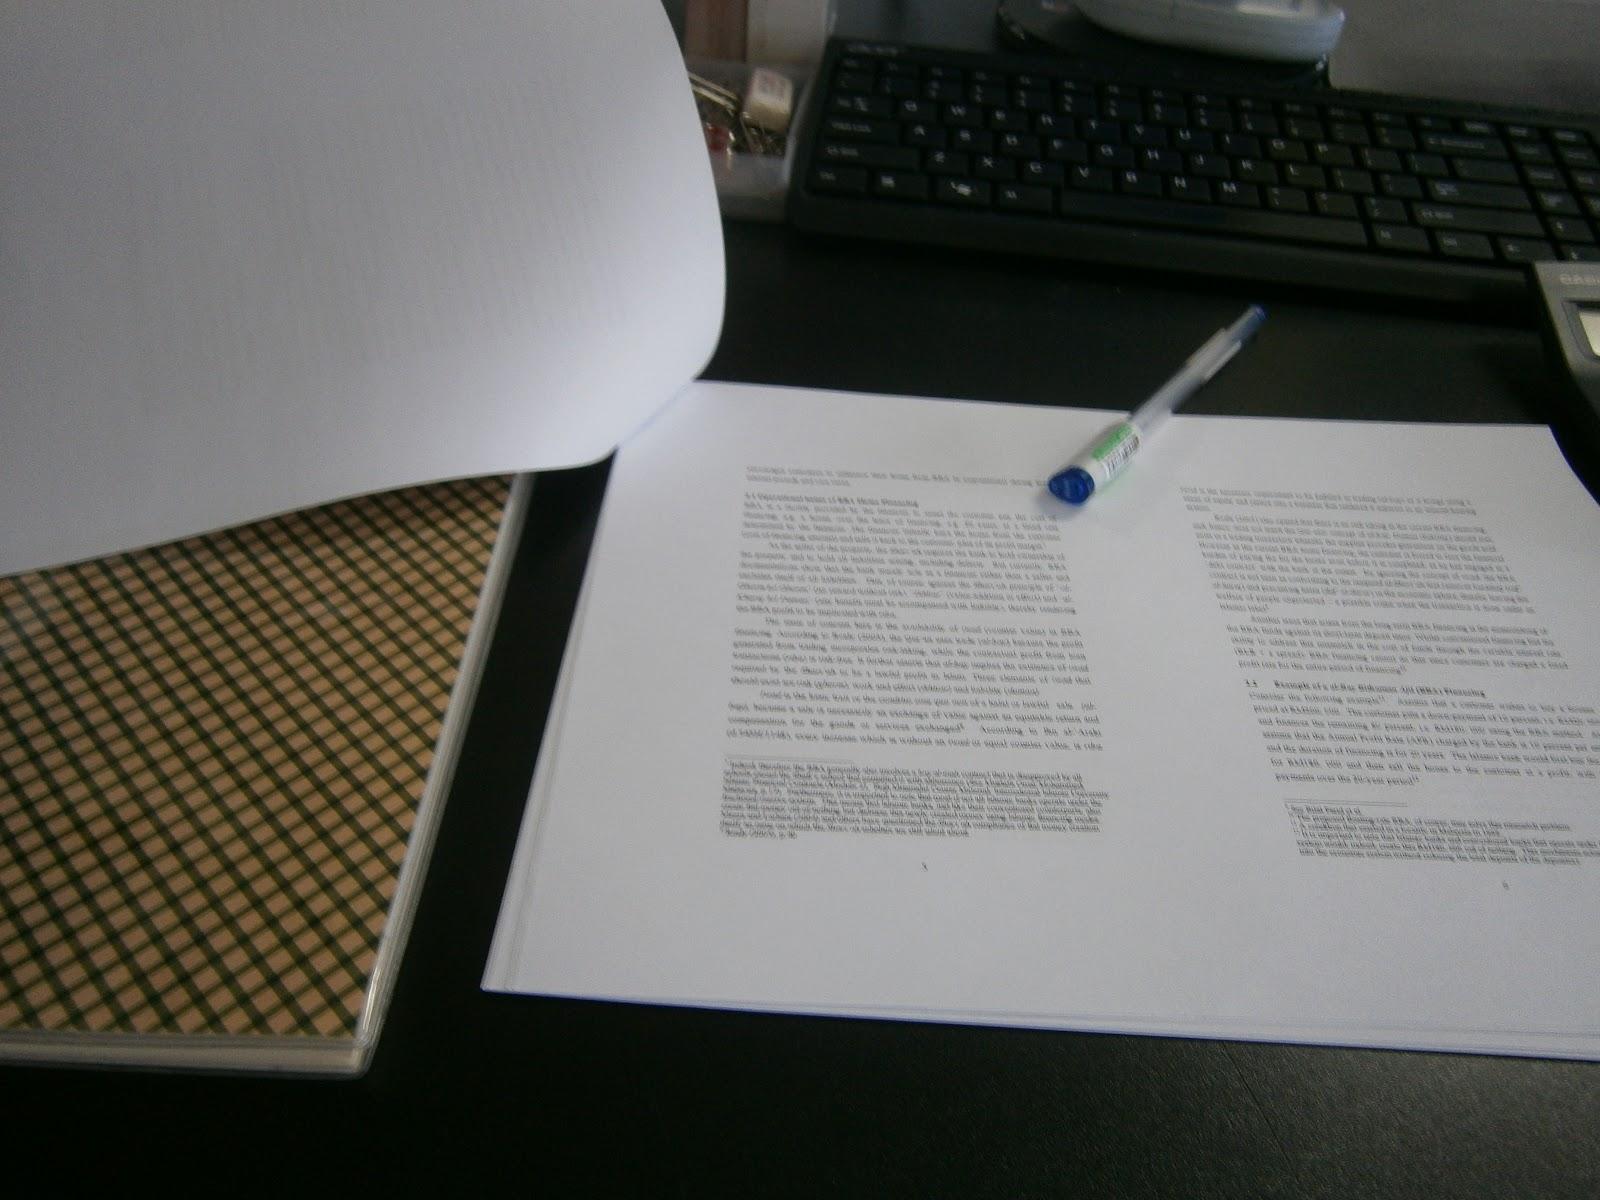 elaun thesis phd Tuntutan elaun bantuan penyediaan thesis disertakan bersama satu salinan thesis serta keterangan untuk perhatian dan tindakan dari pihak tuan jenis.